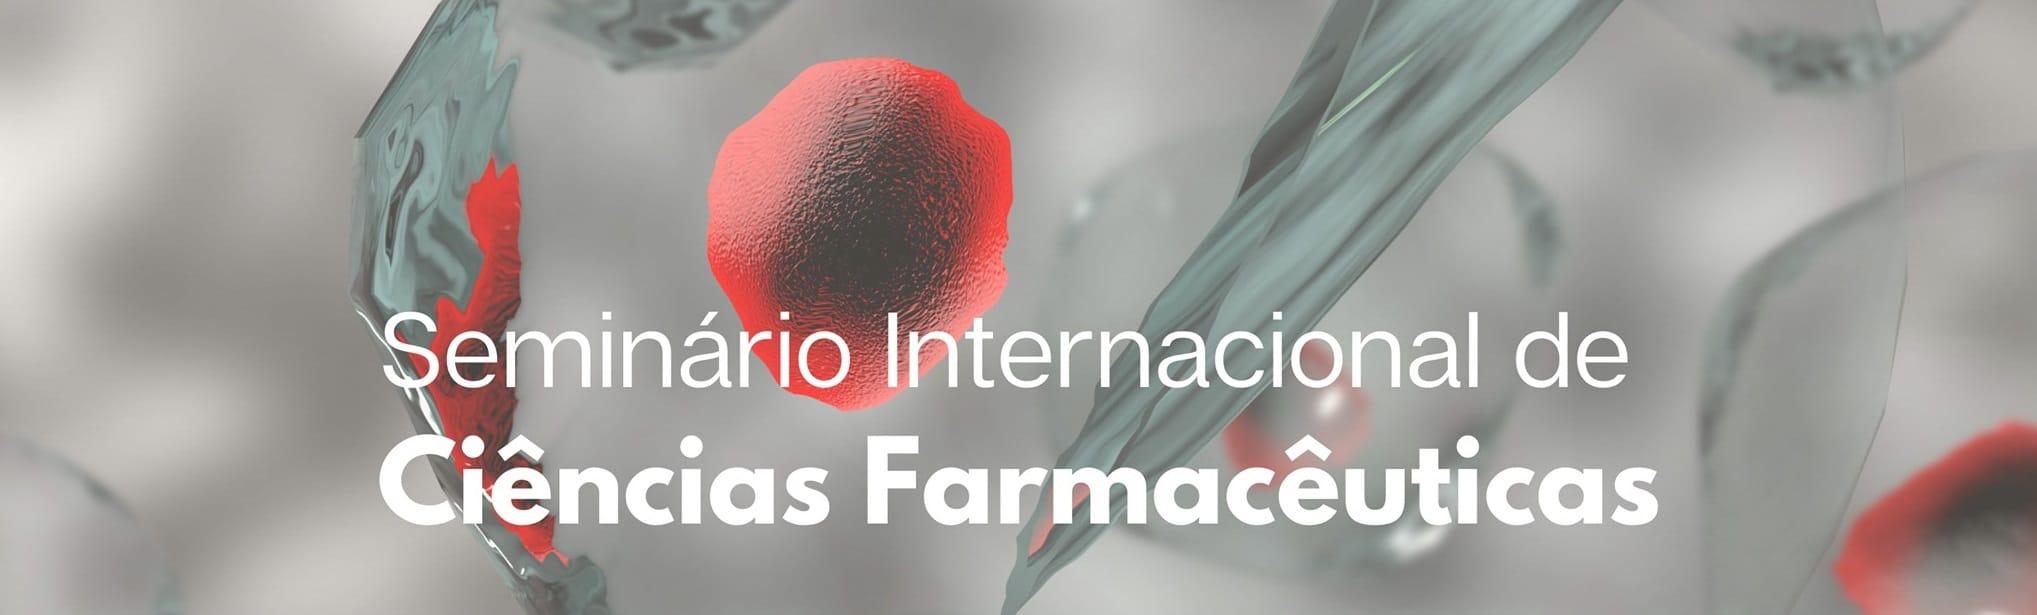 palestra_online_fasf_tecnologia_crispr